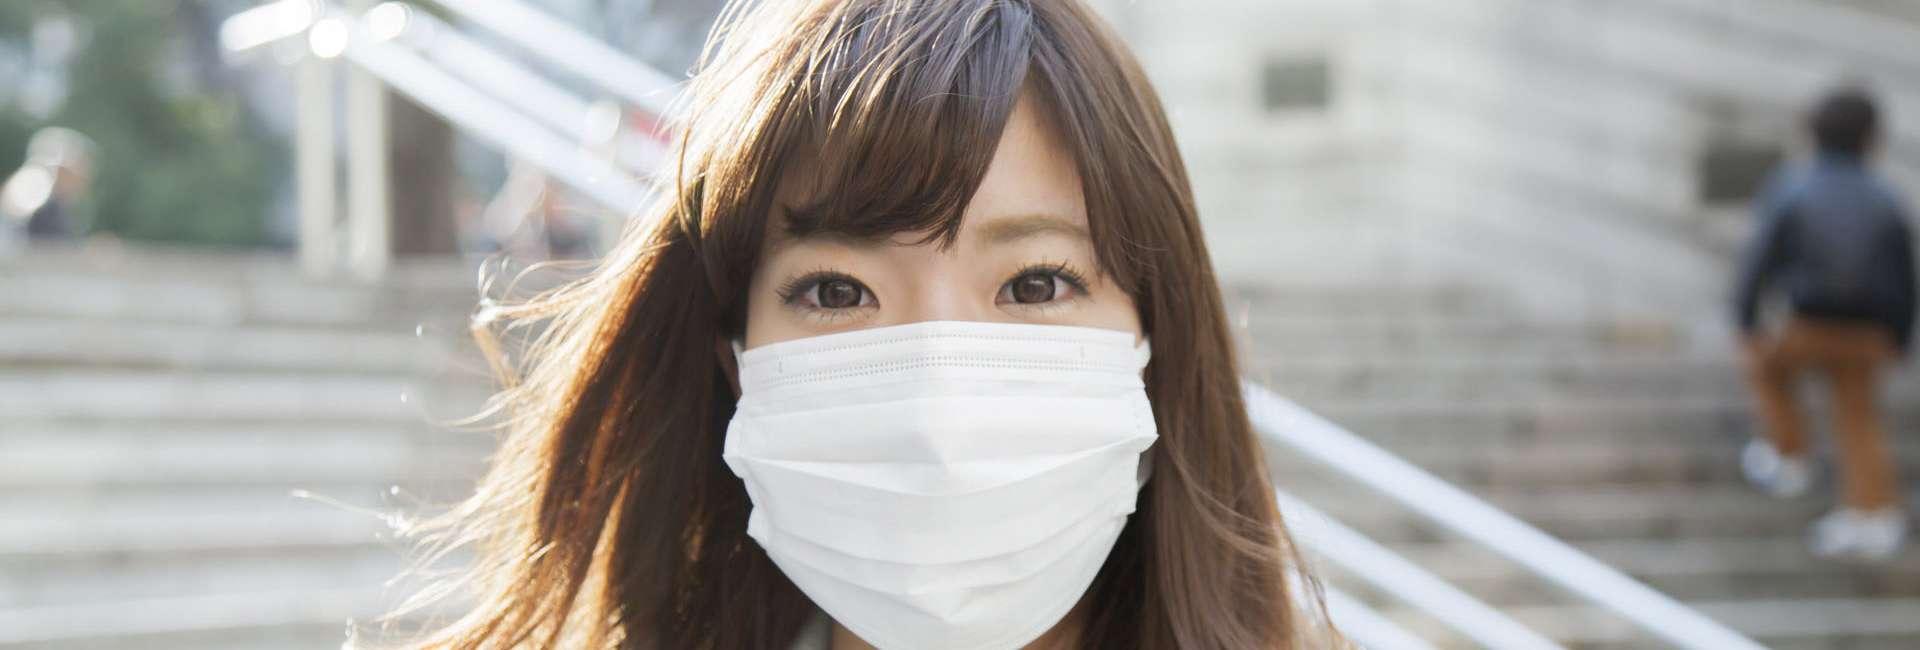 giapponesi indossano le mascherine